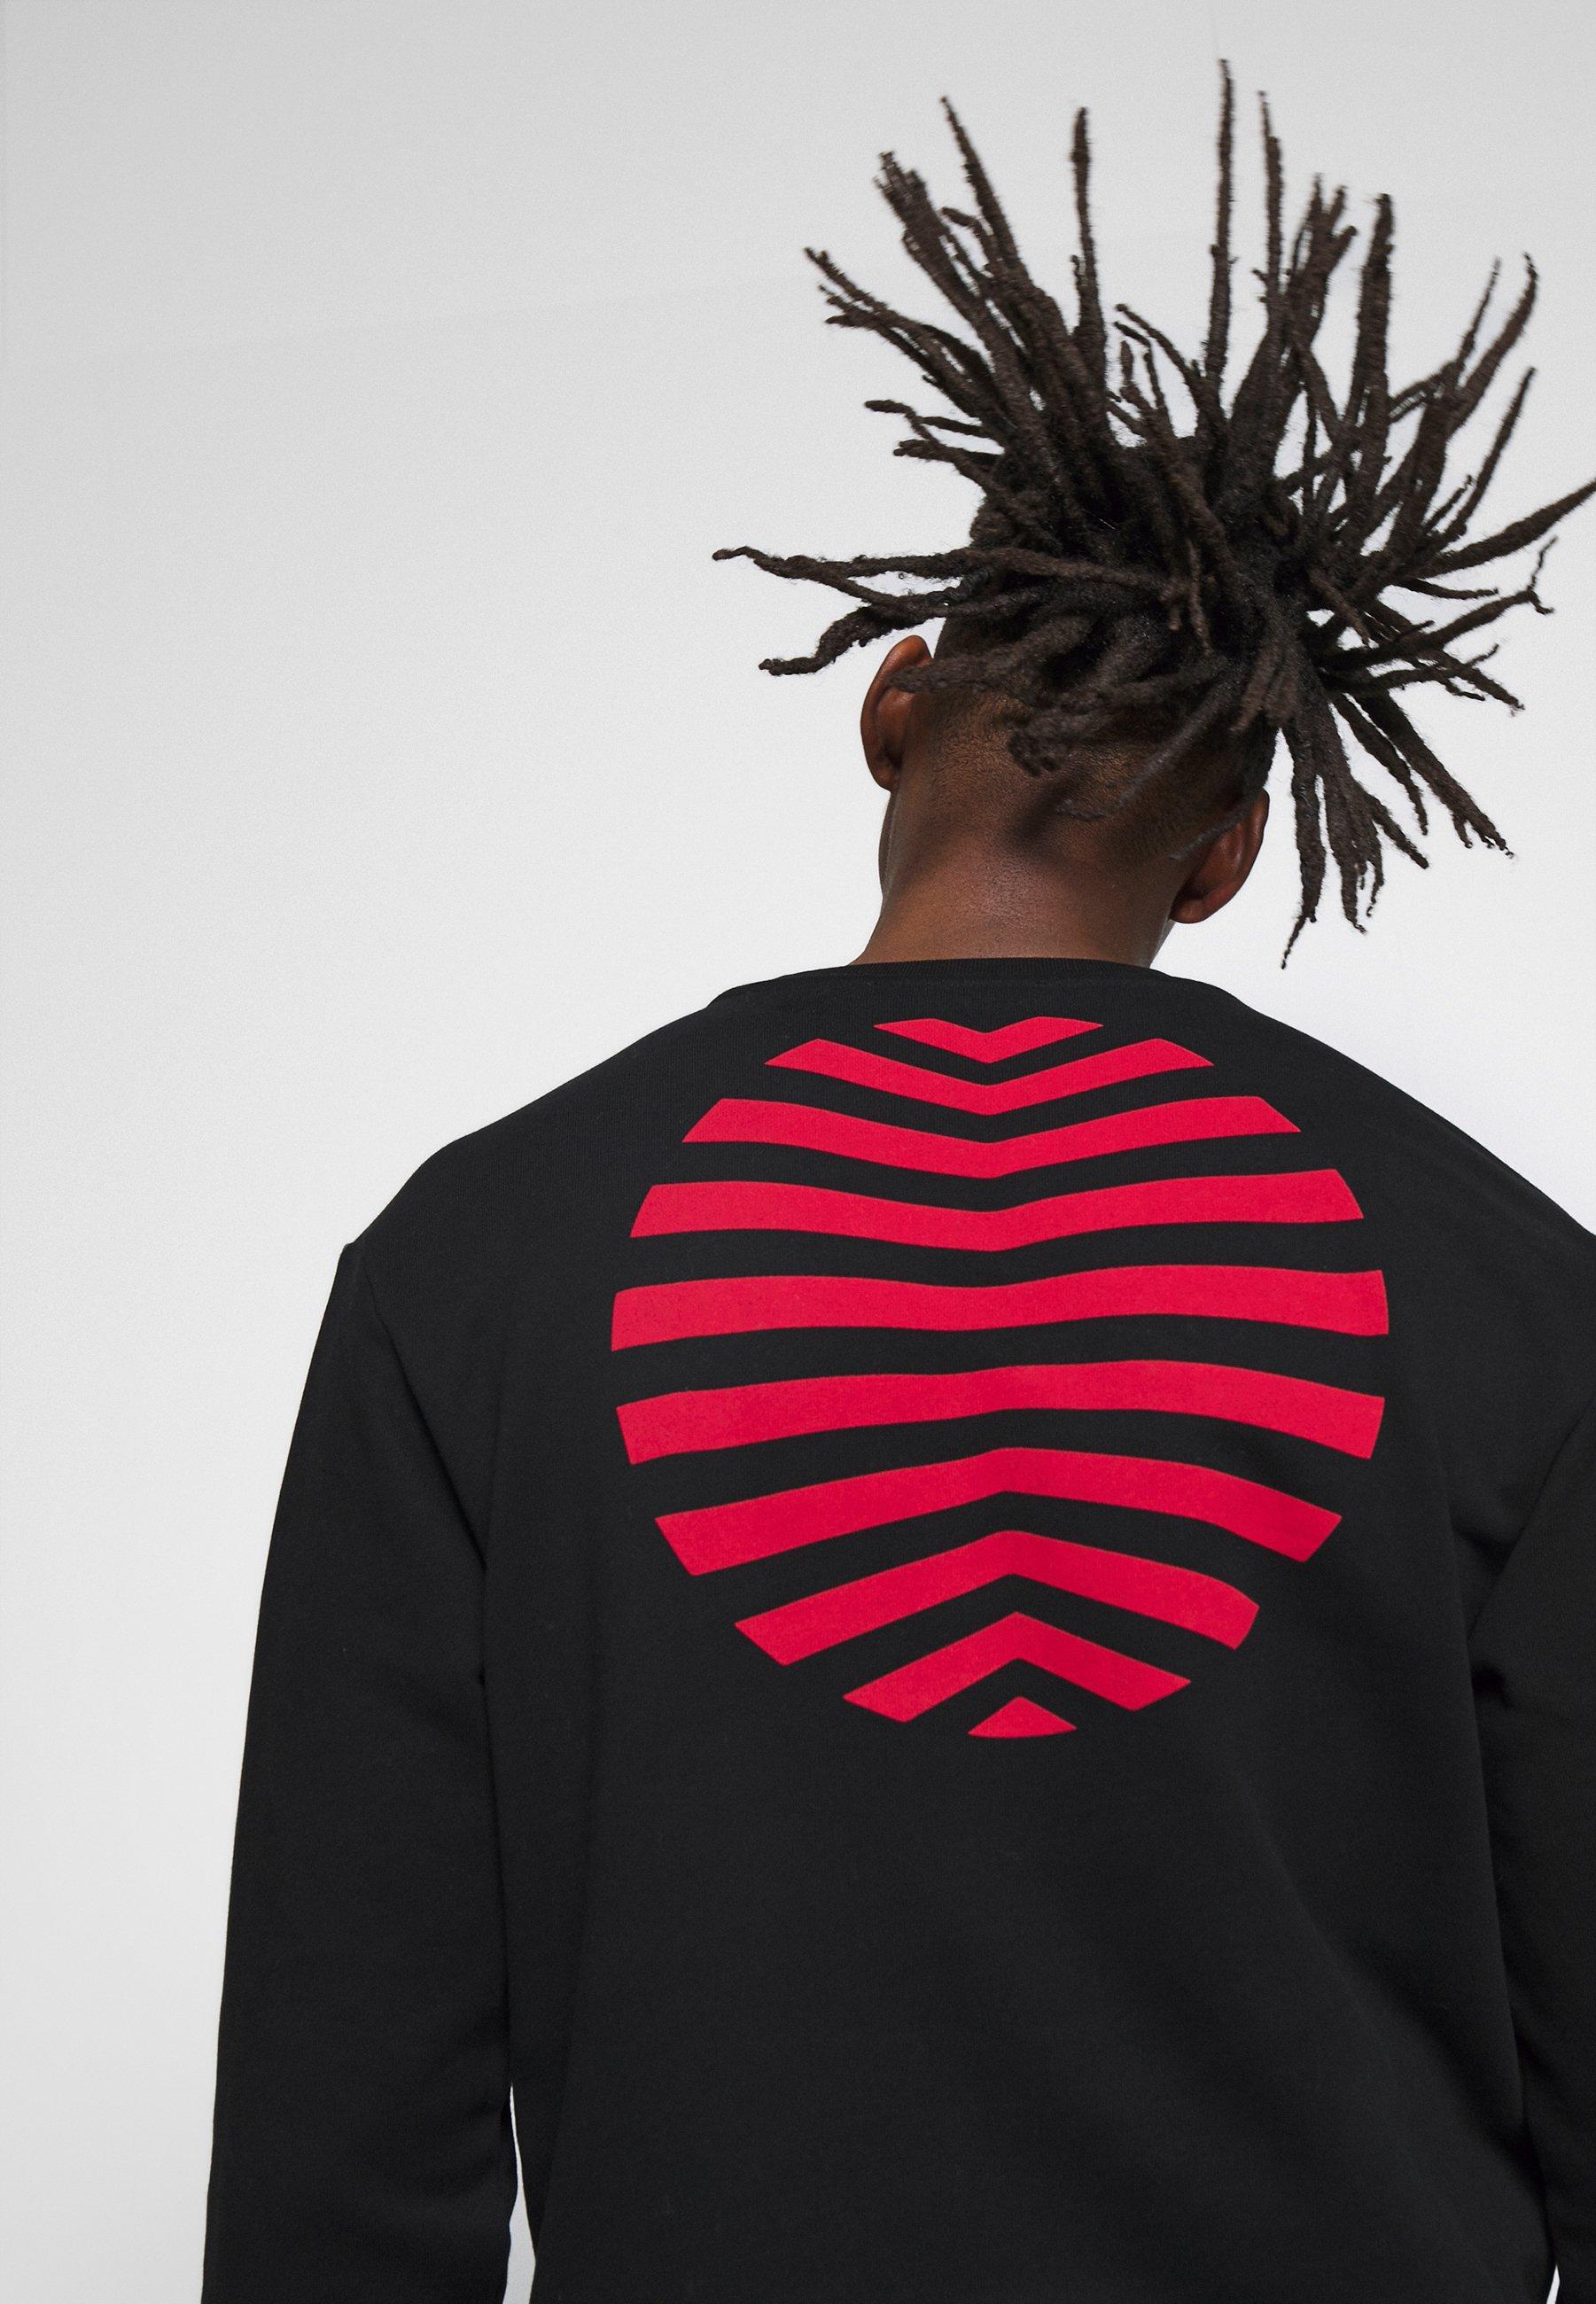 2020 Uusin Miesten vaatteet Sarja dfKJIUp97454sfGHYHD McQ Alexander McQueen MONSTER  Collegepaita darkest black/rouge